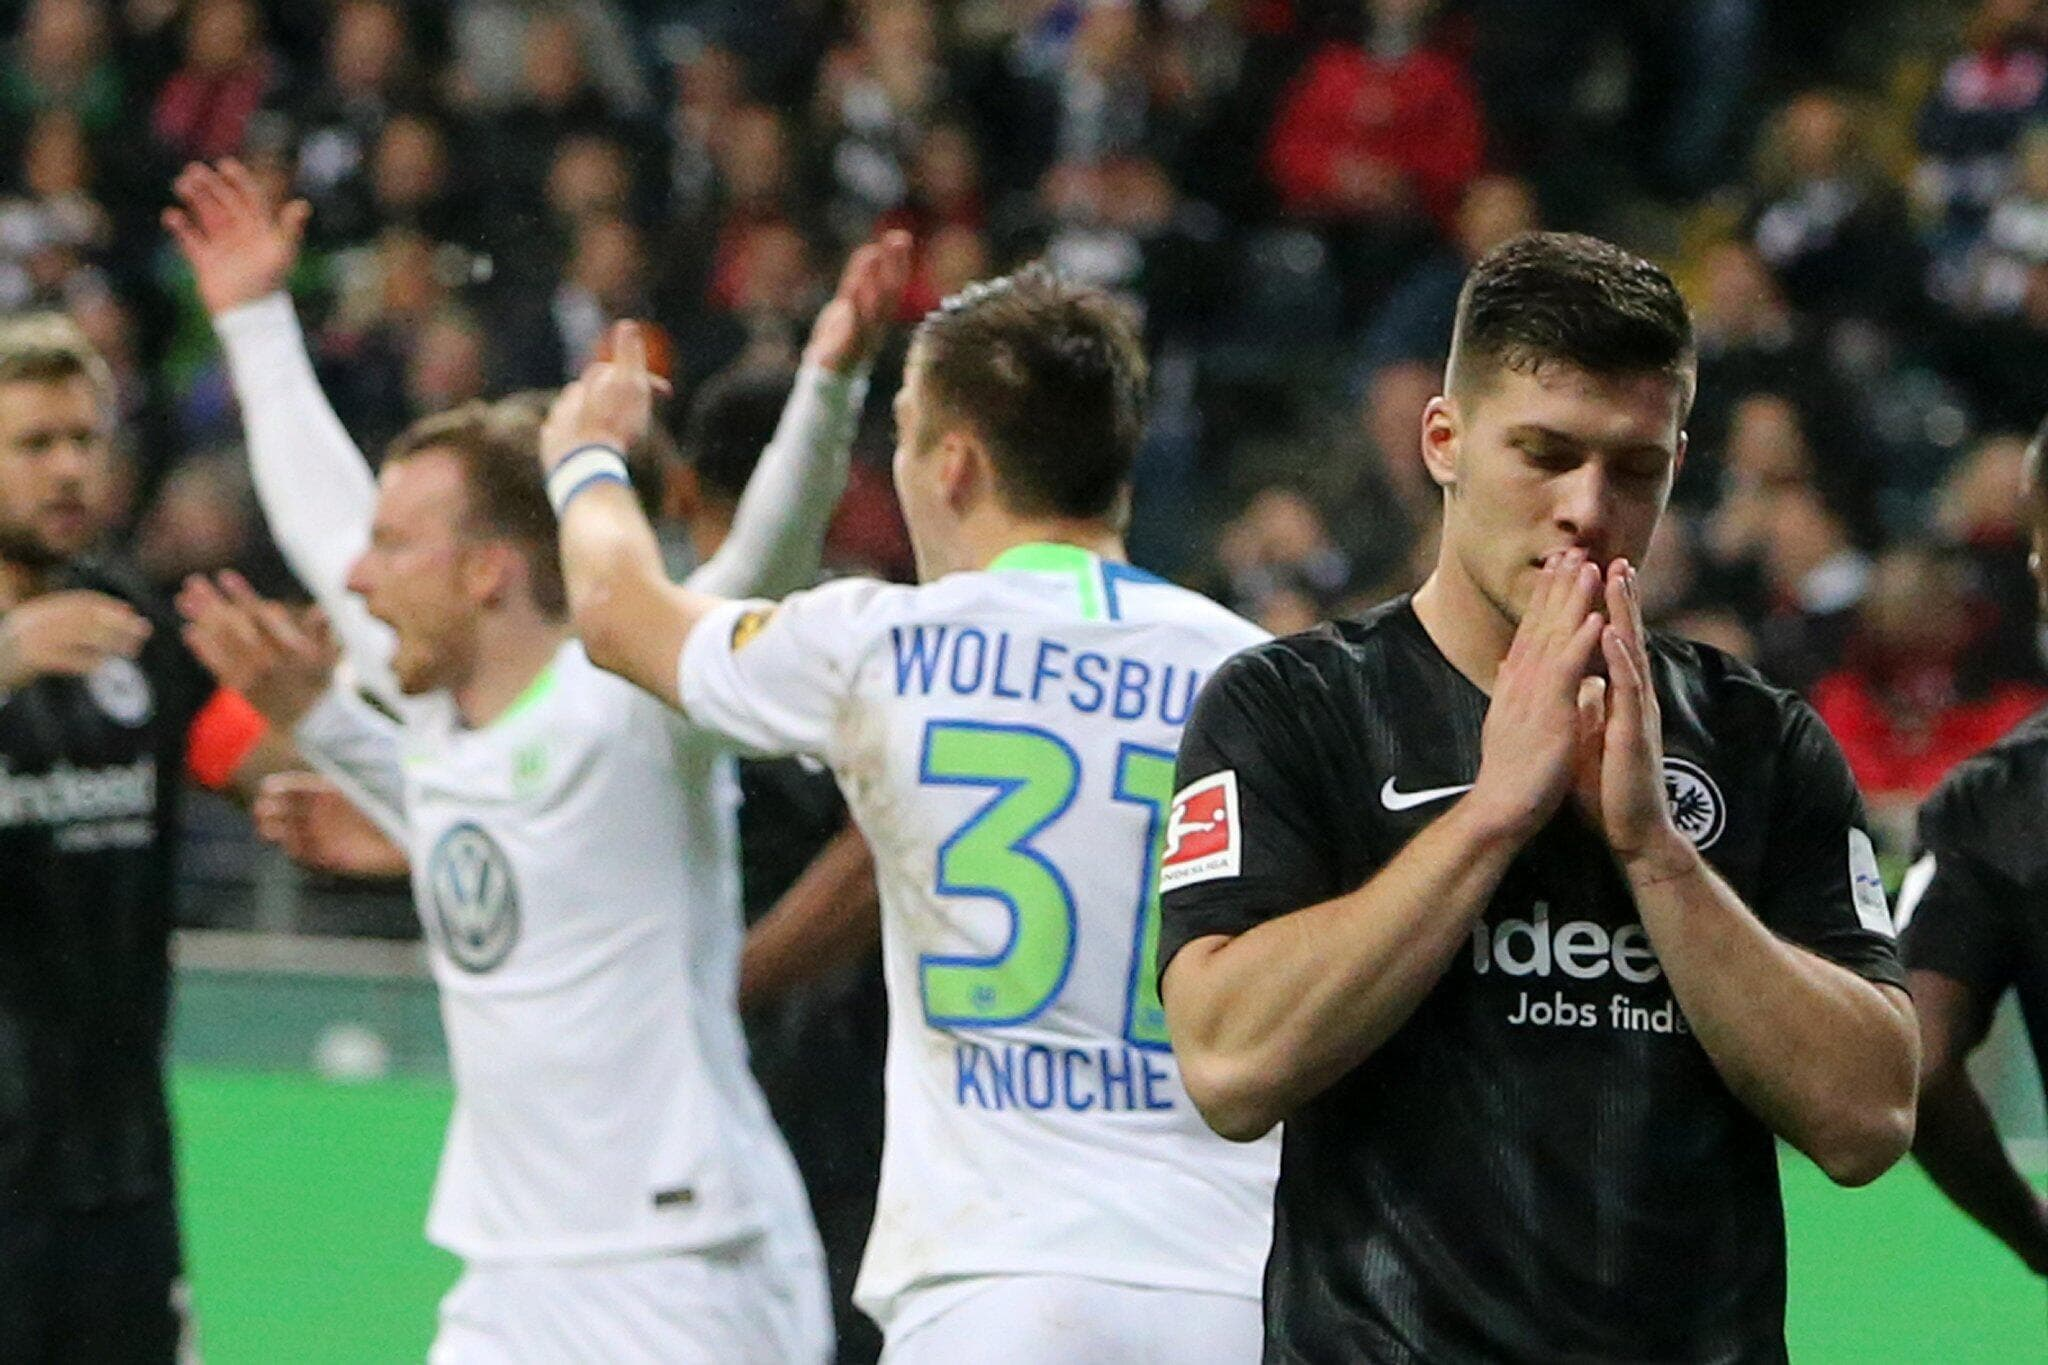 soi-keo-wolfsburg-vs-eintracht-frankfurt-vao-20h30-ngay-30-5-2020-1